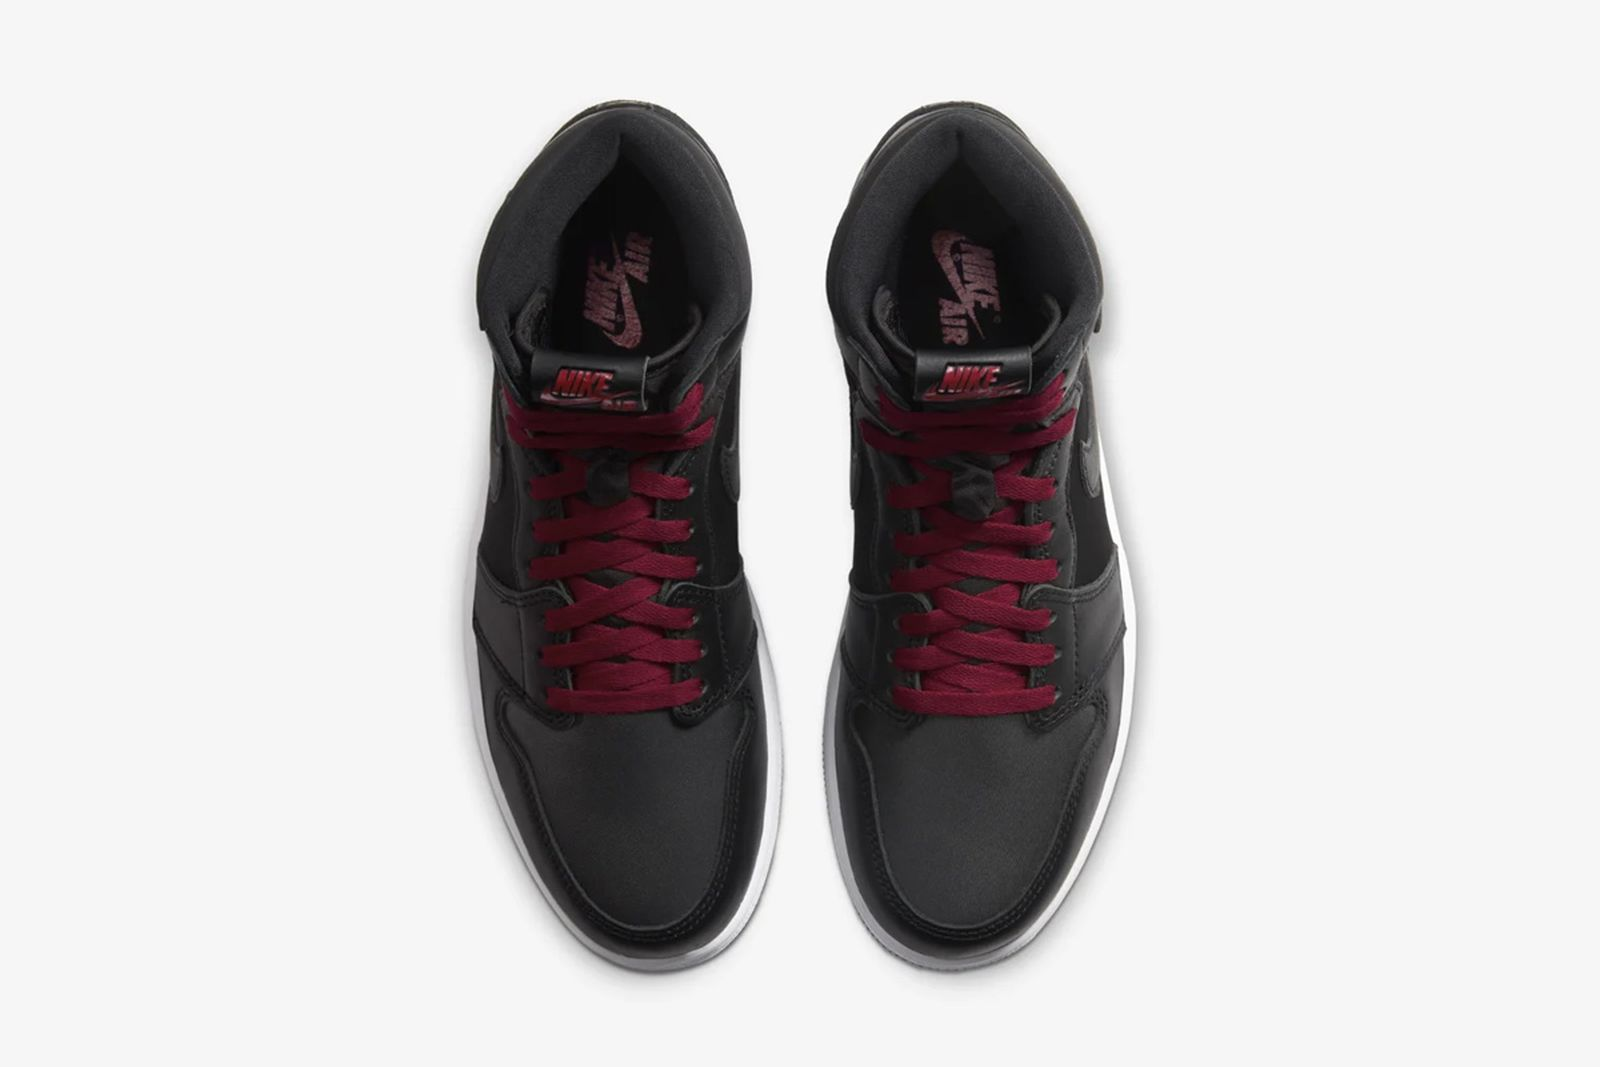 nike-air-jordan-1-neoprene-black-red-release-date-price-04